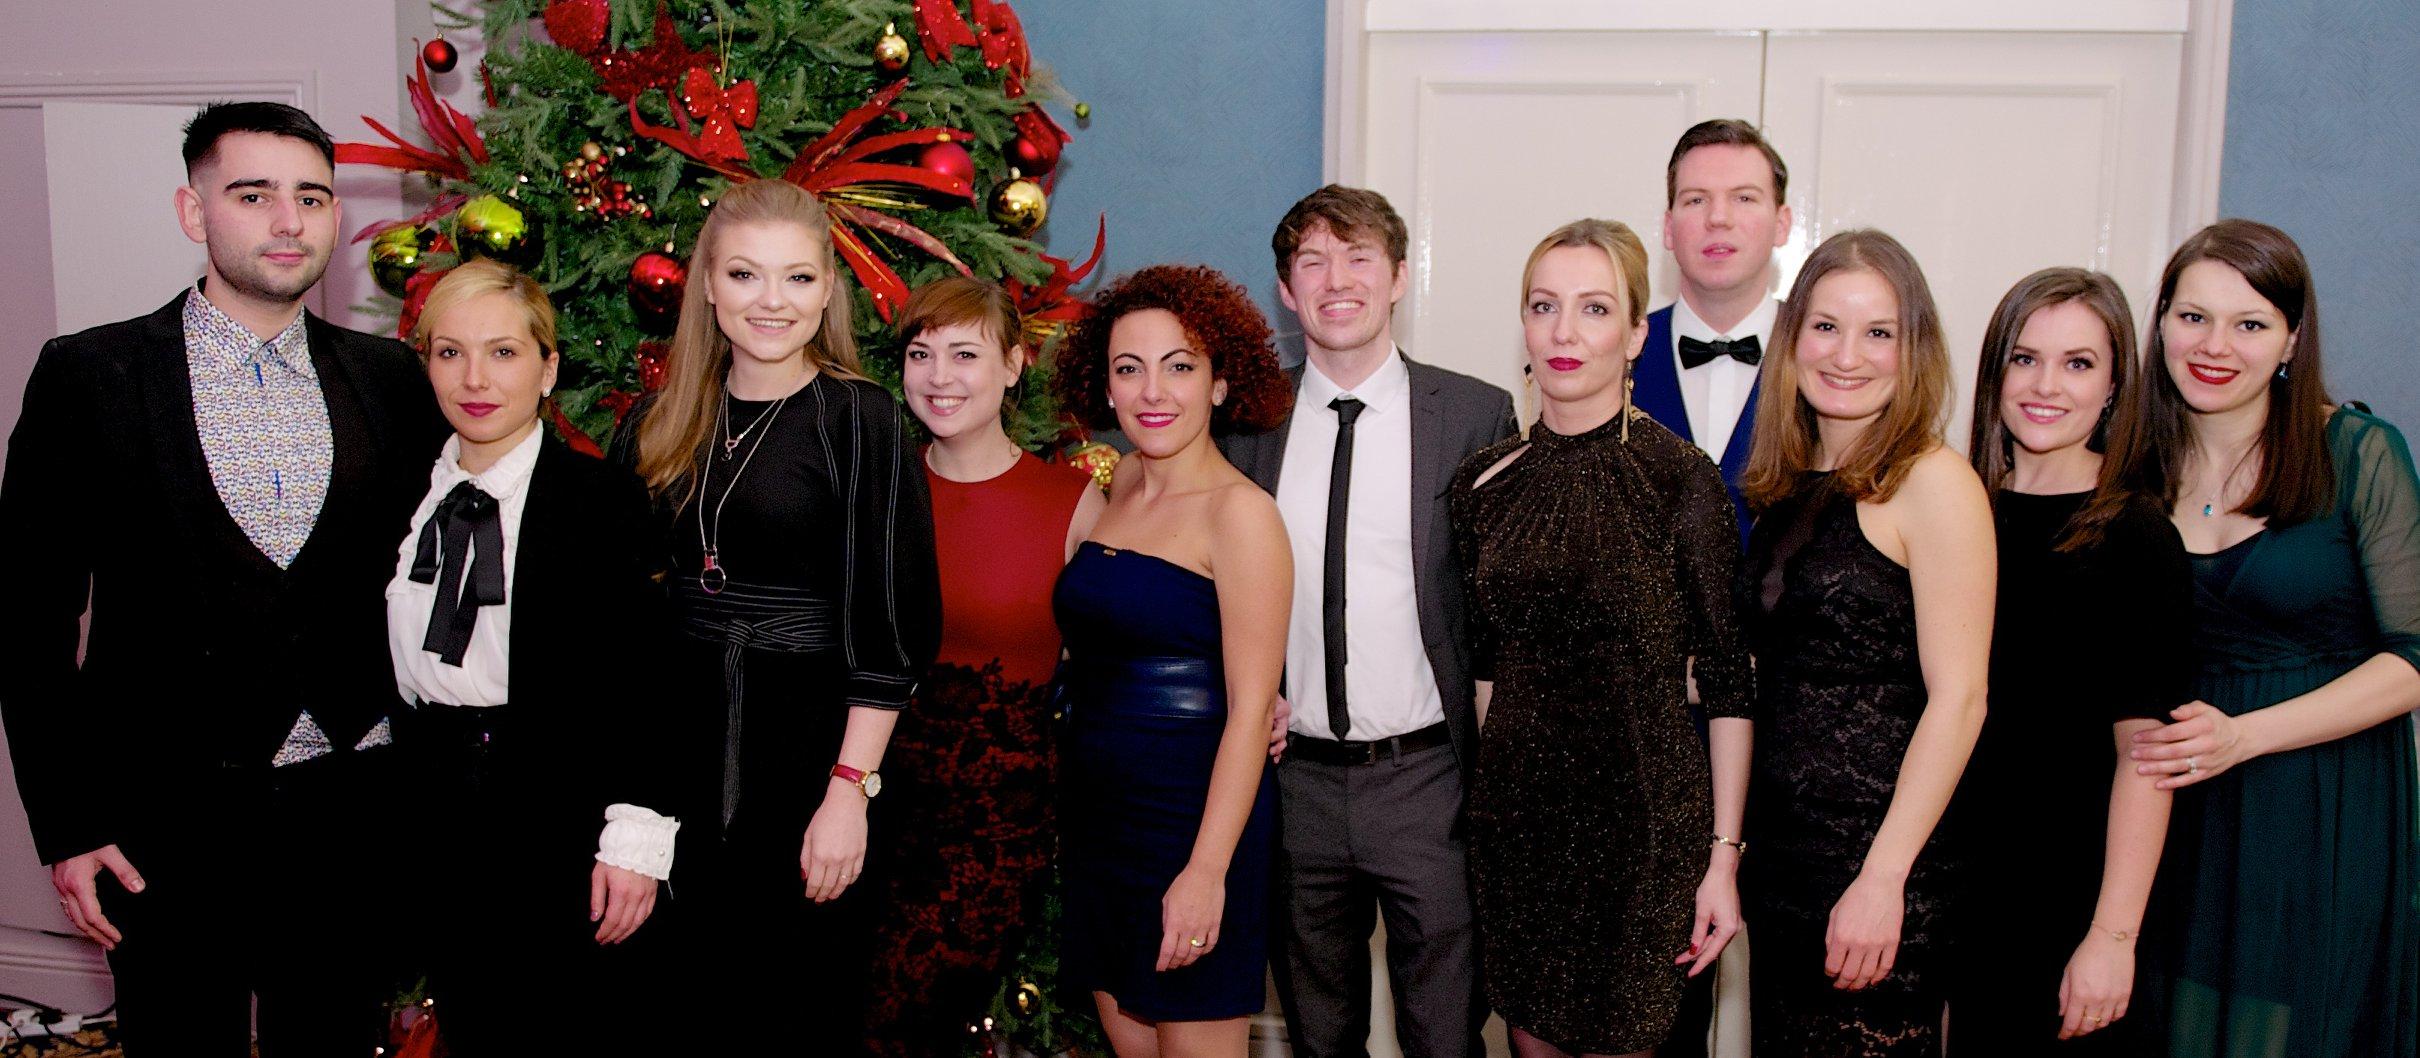 tomasstolc.sk-dominika-stolcova-rozhovor-vianocna-party-v-praci